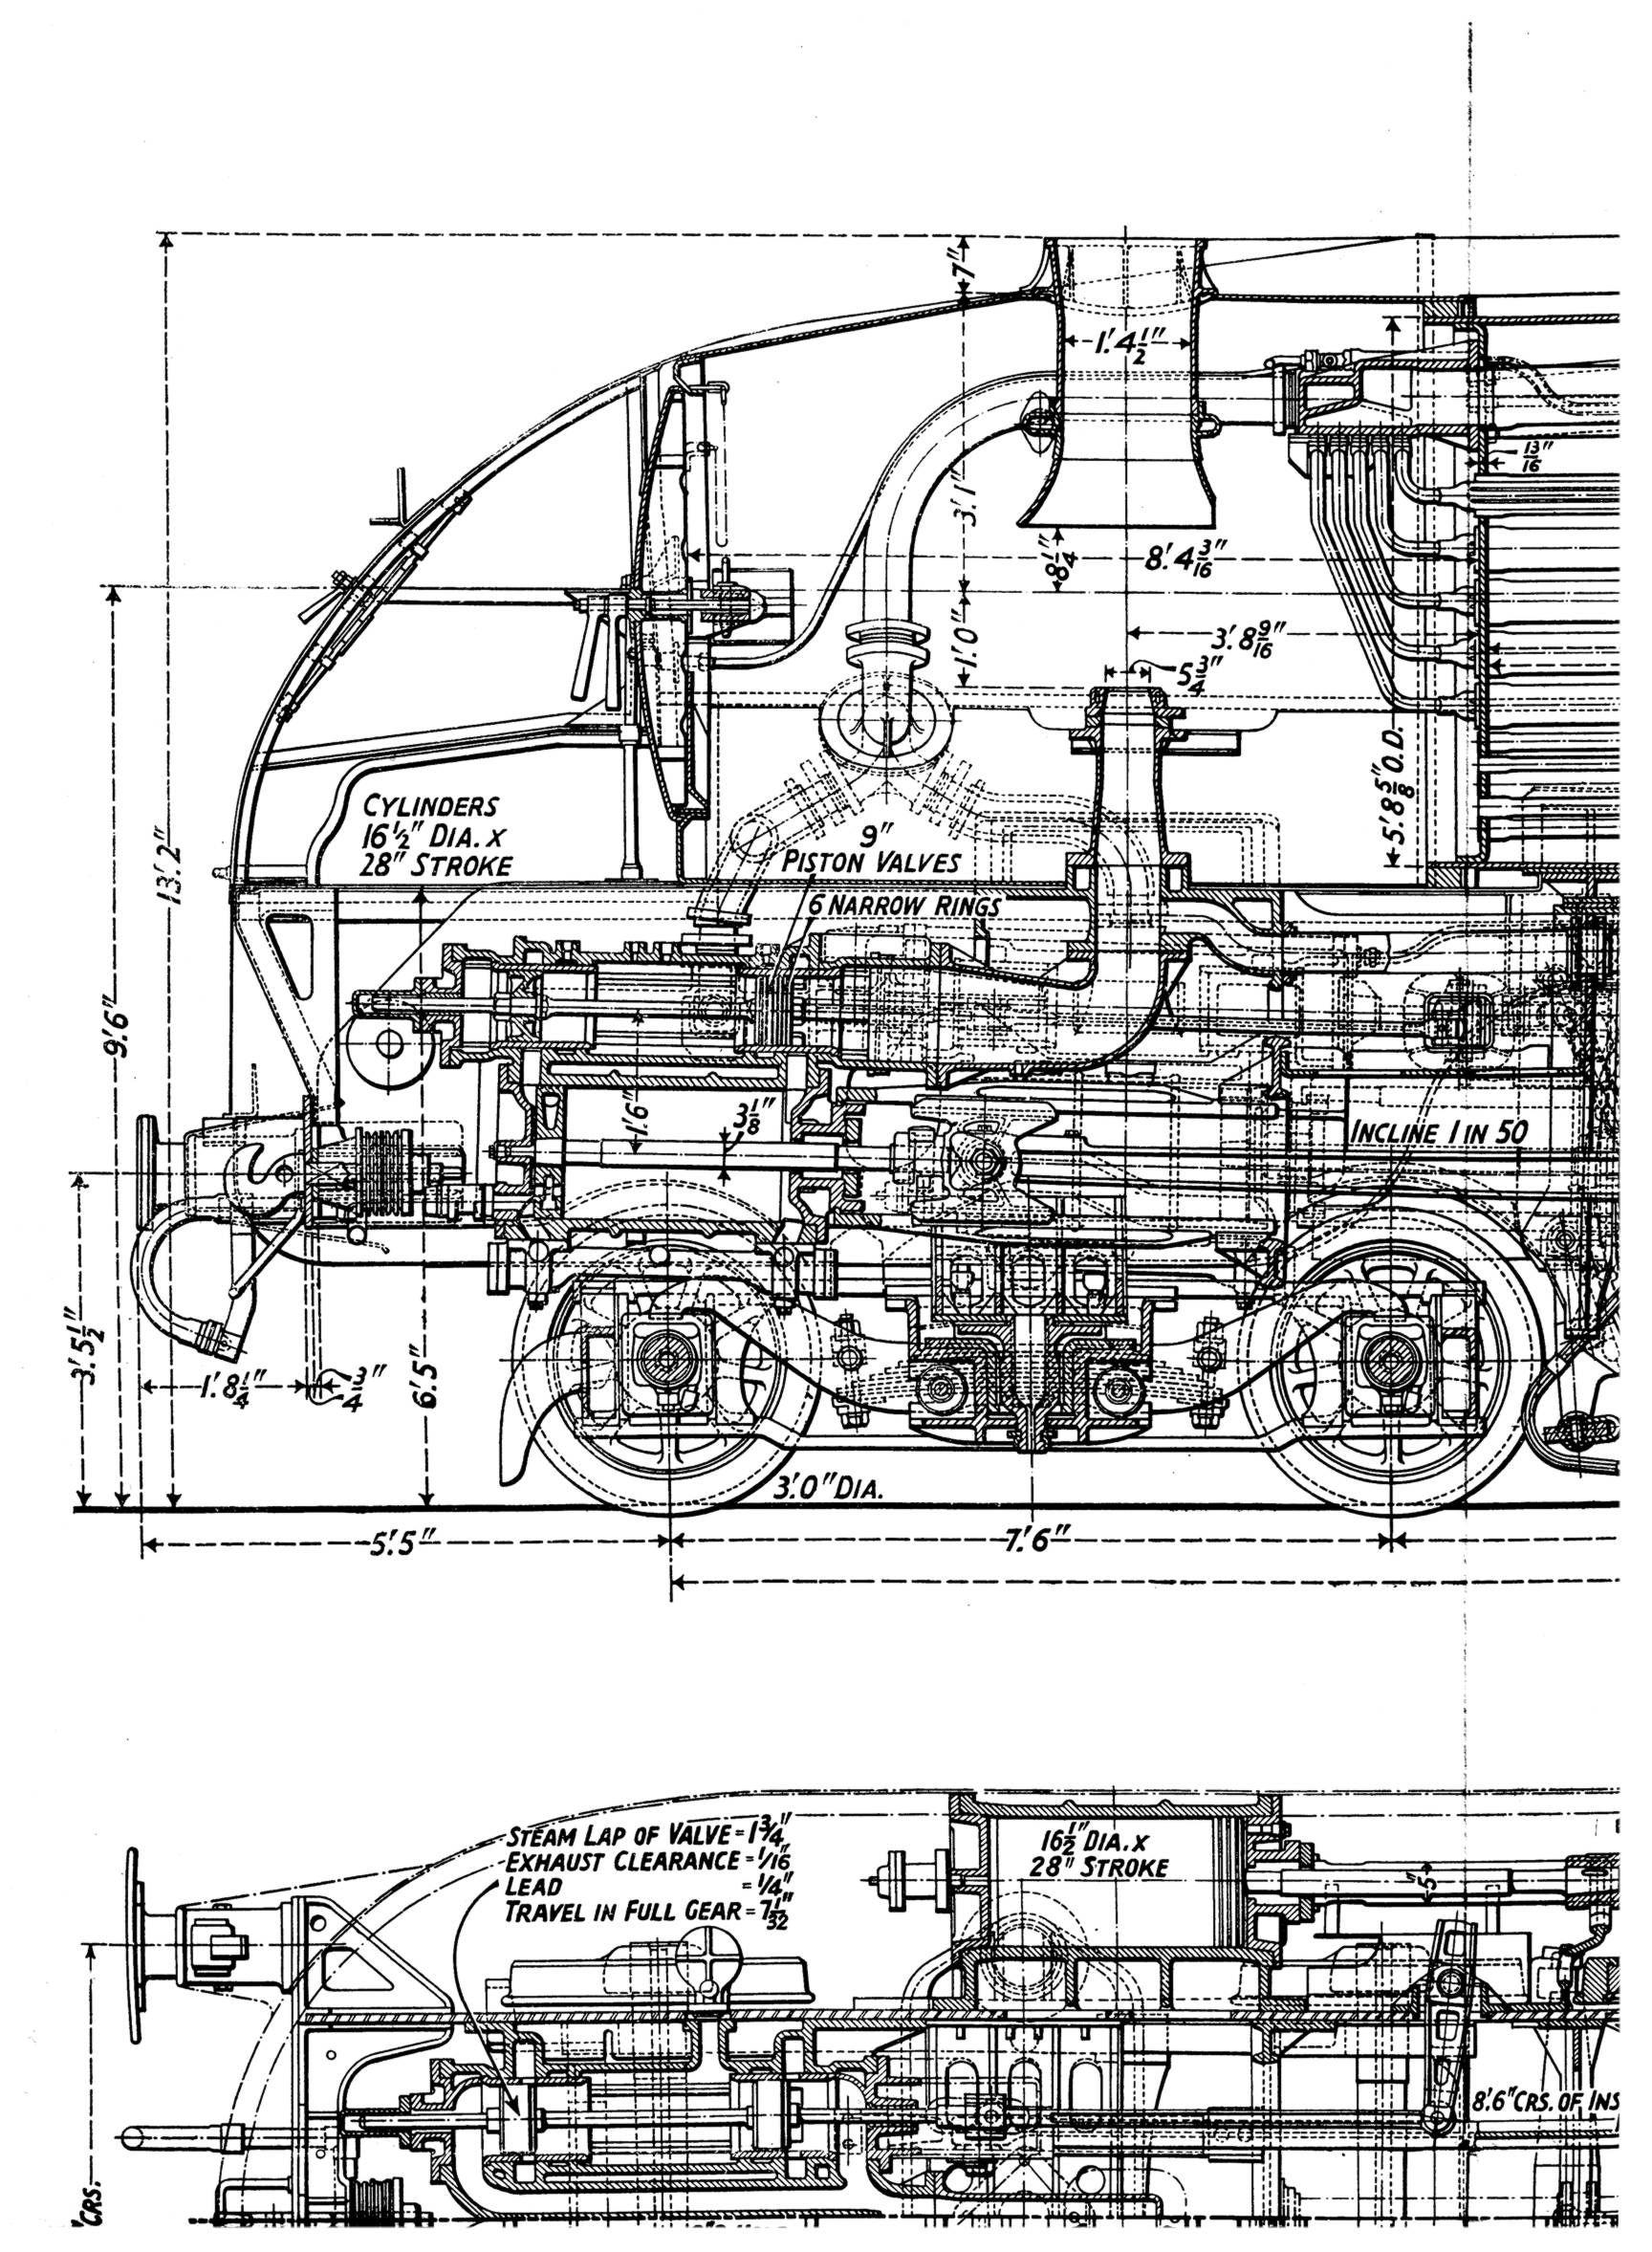 Coronation6220_blueprint_side_detail_nose.jpg (JPEG Image, 1728 × 2355  pixels) - Scaled (51